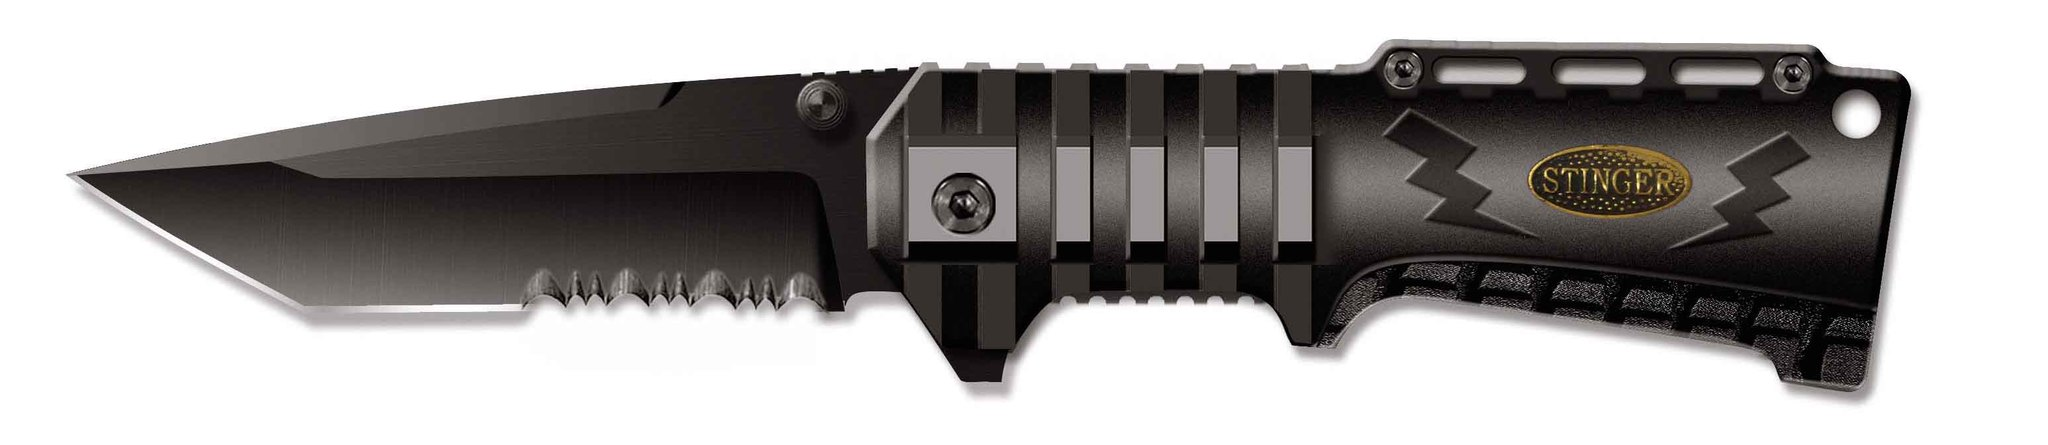 Нож складной Stinger SA-574B, сталь 420, алюминий нож складной stinger sa 574b сталь 420 алюминий